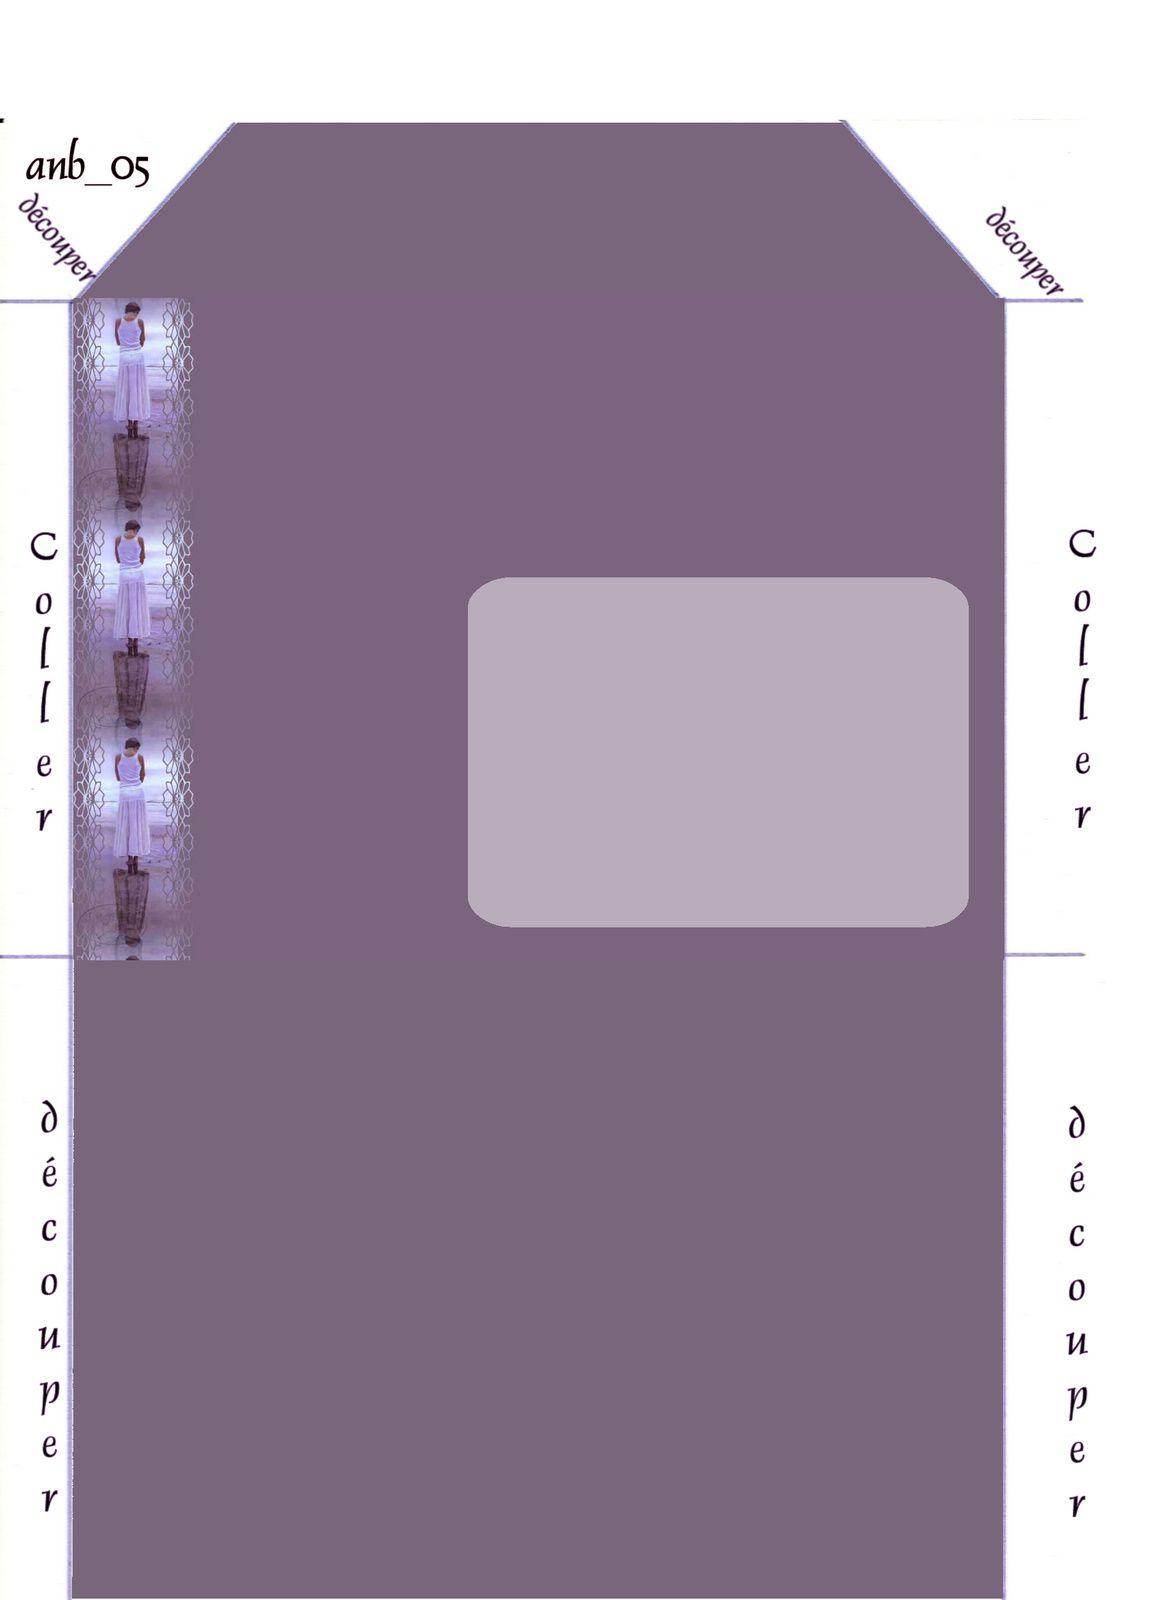 Femme plage Incredimail &amp&#x3B; outlook &amp&#x3B; Papier A4 h l &amp&#x3B; enveloppe &amp&#x3B; 2 cartes A5 &amp&#x3B; signets    fem_bpd_stevehanks_reflecting_thetide